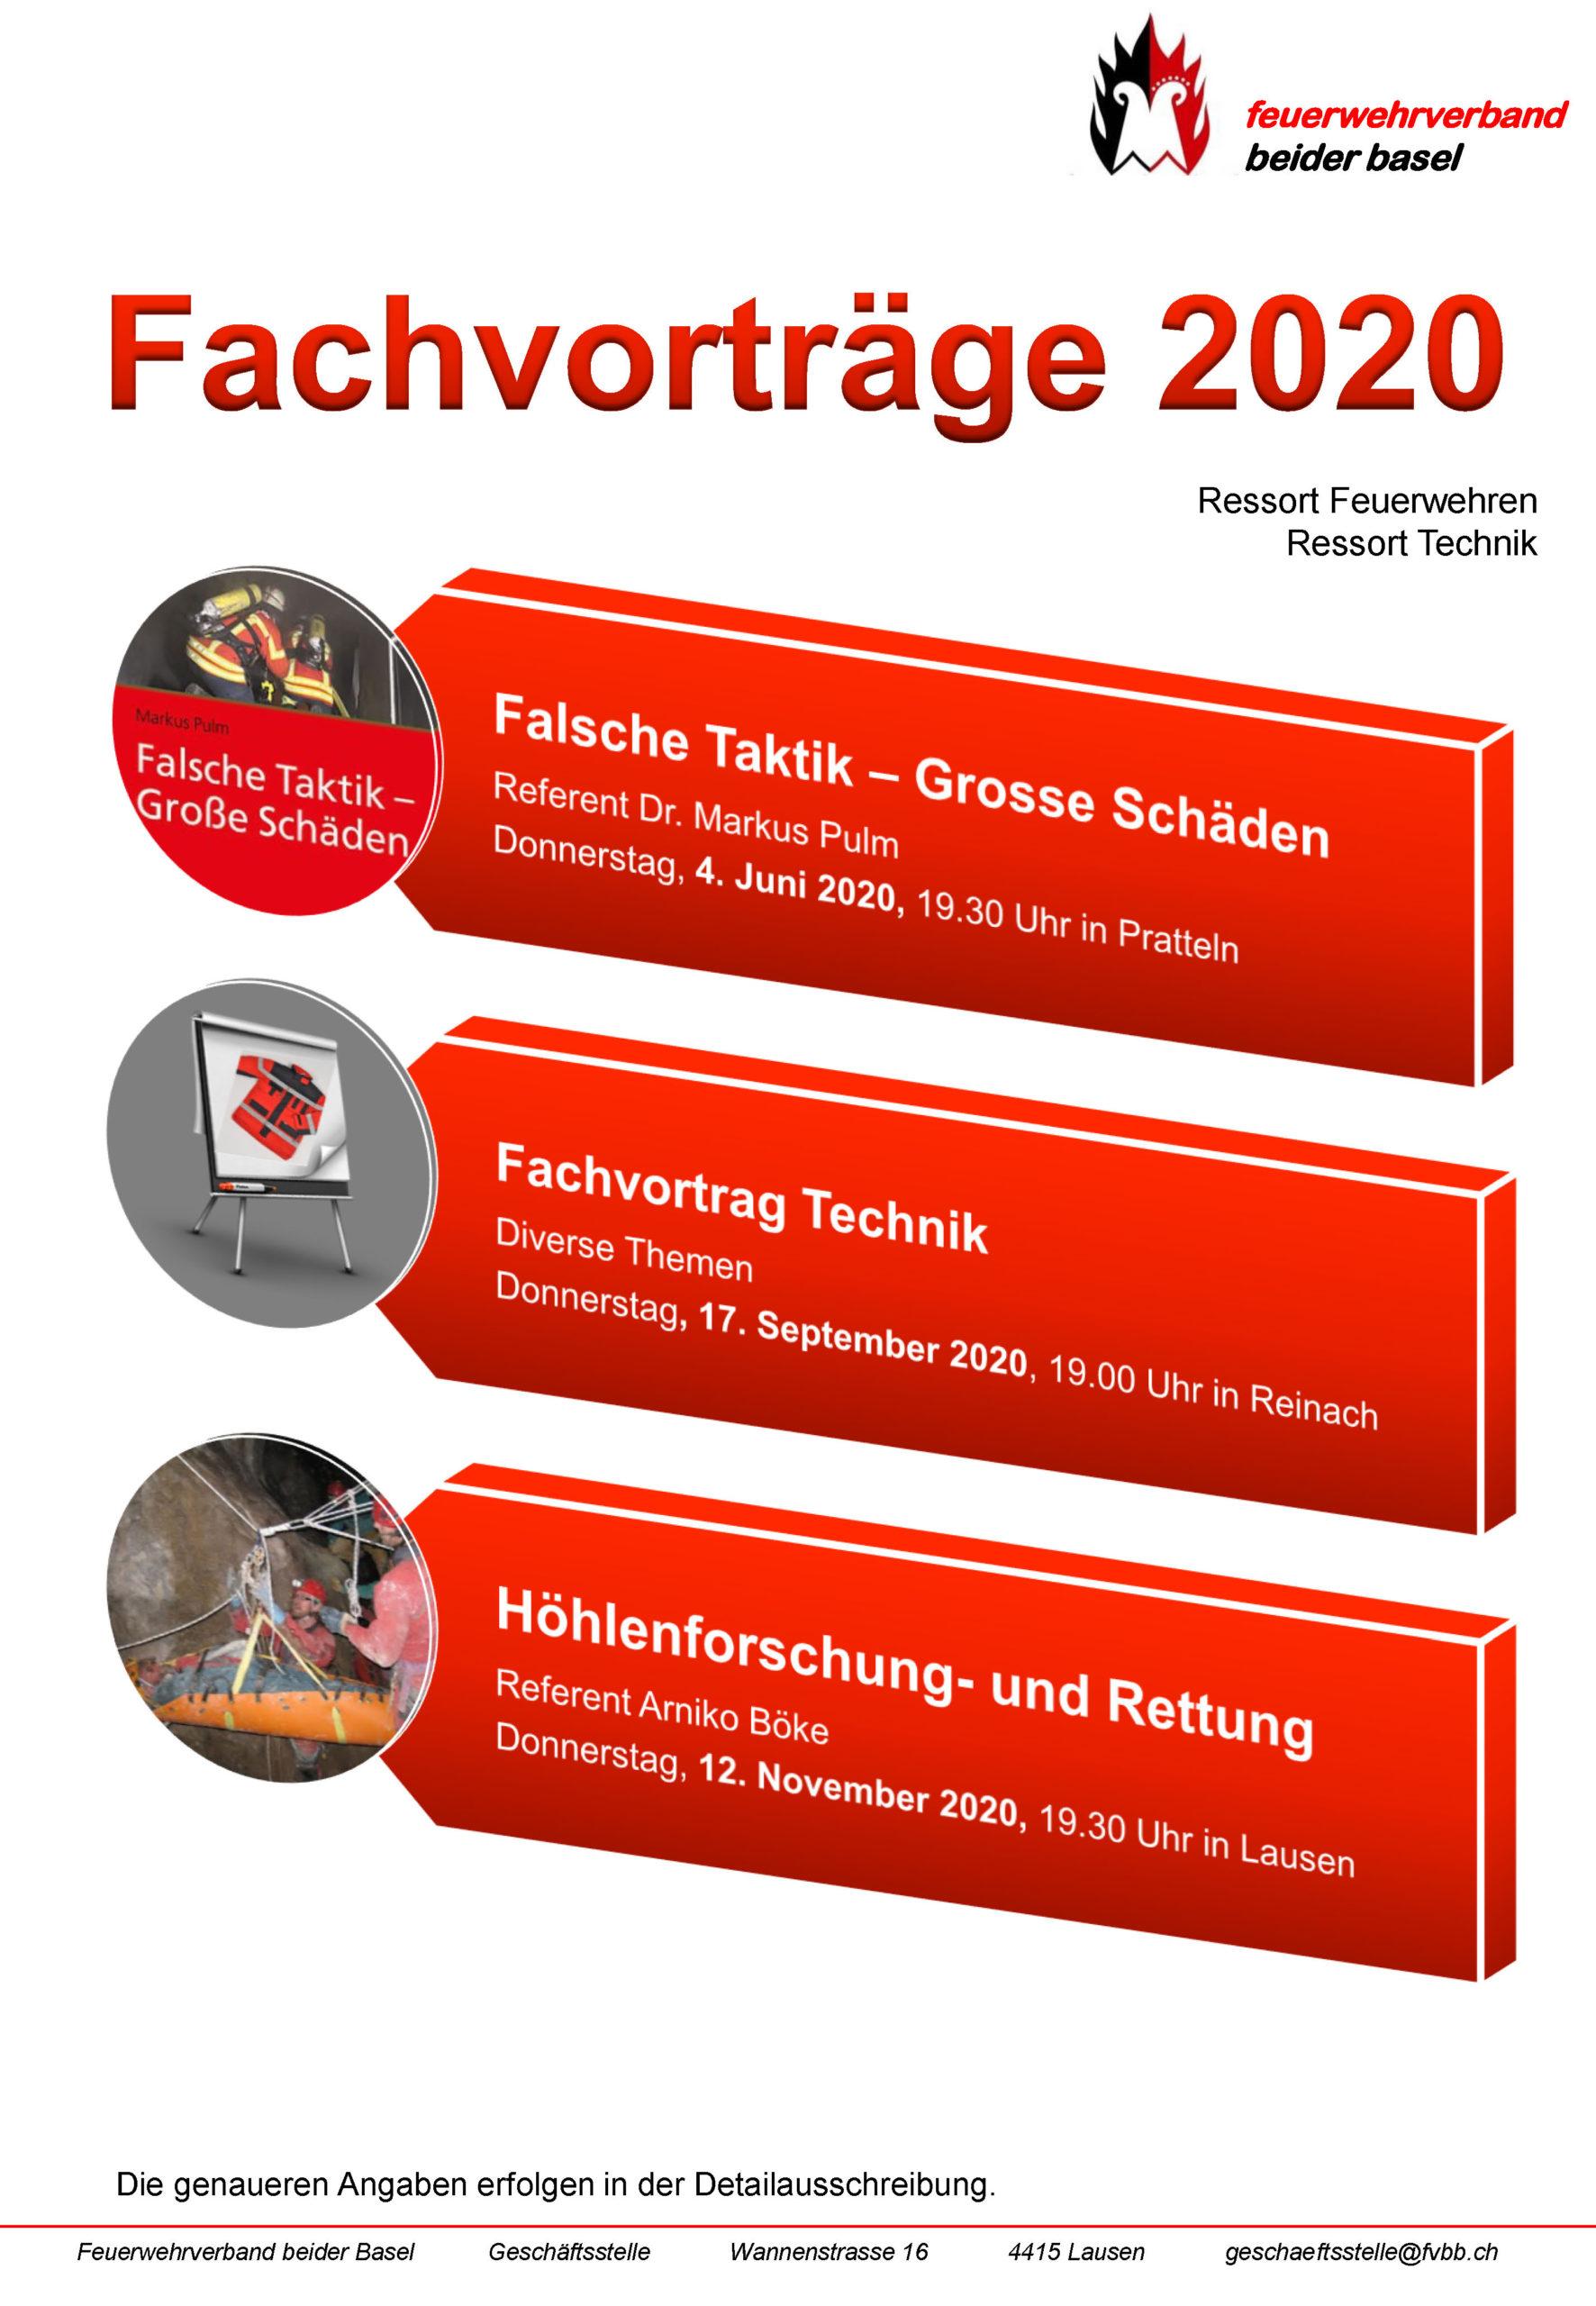 Fachvortrag FVBB im 2020